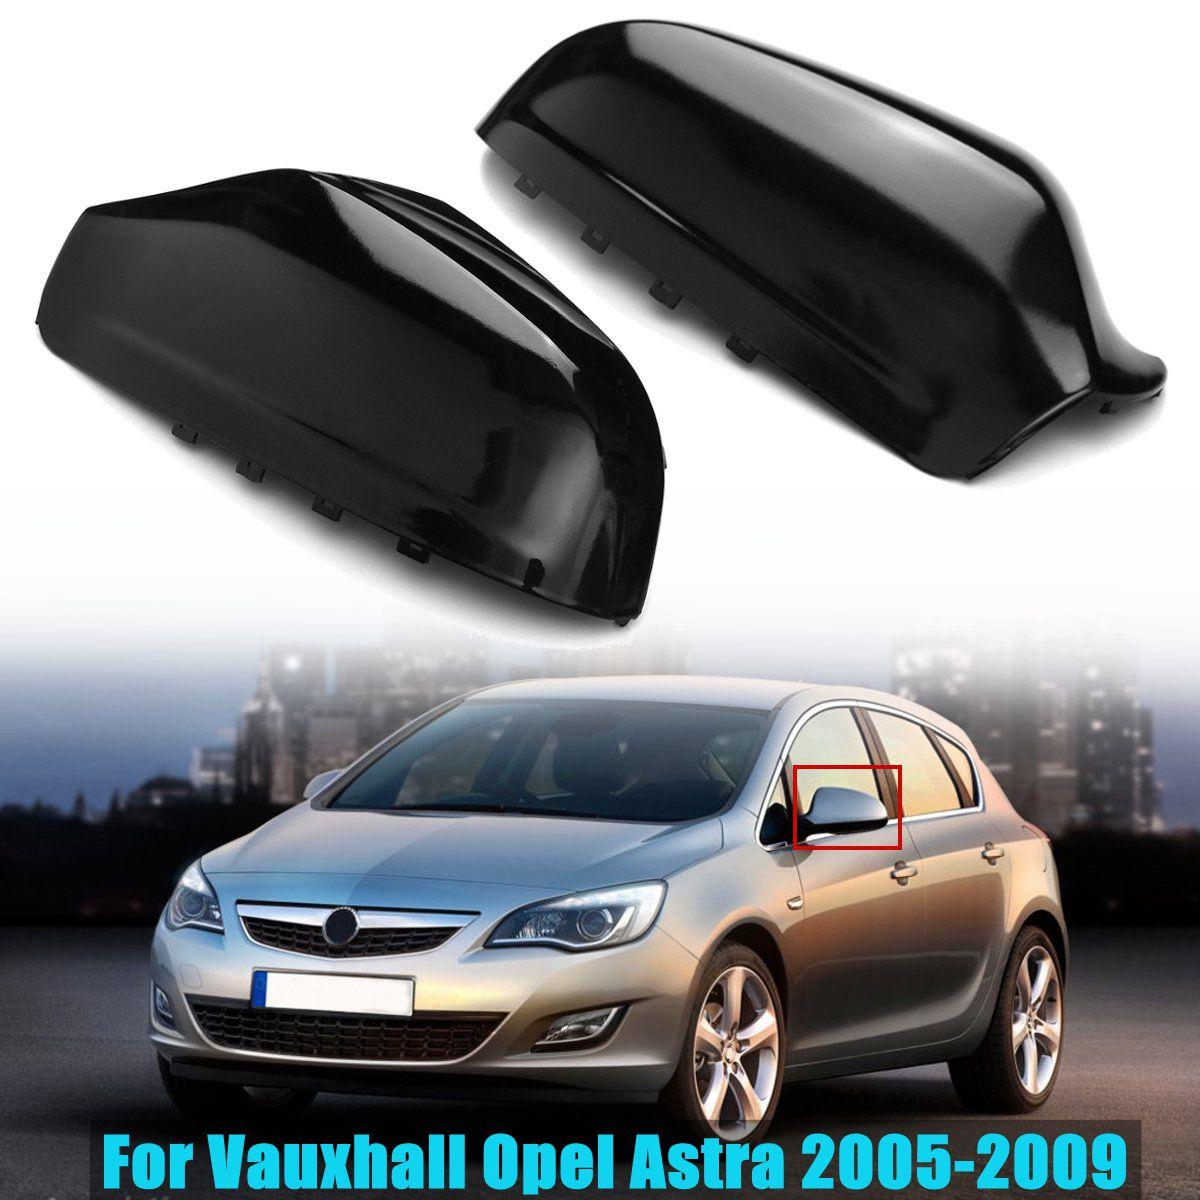 Carcasa espejo retrovisor Opel Astra H Copiloto Derecha 04=/>08